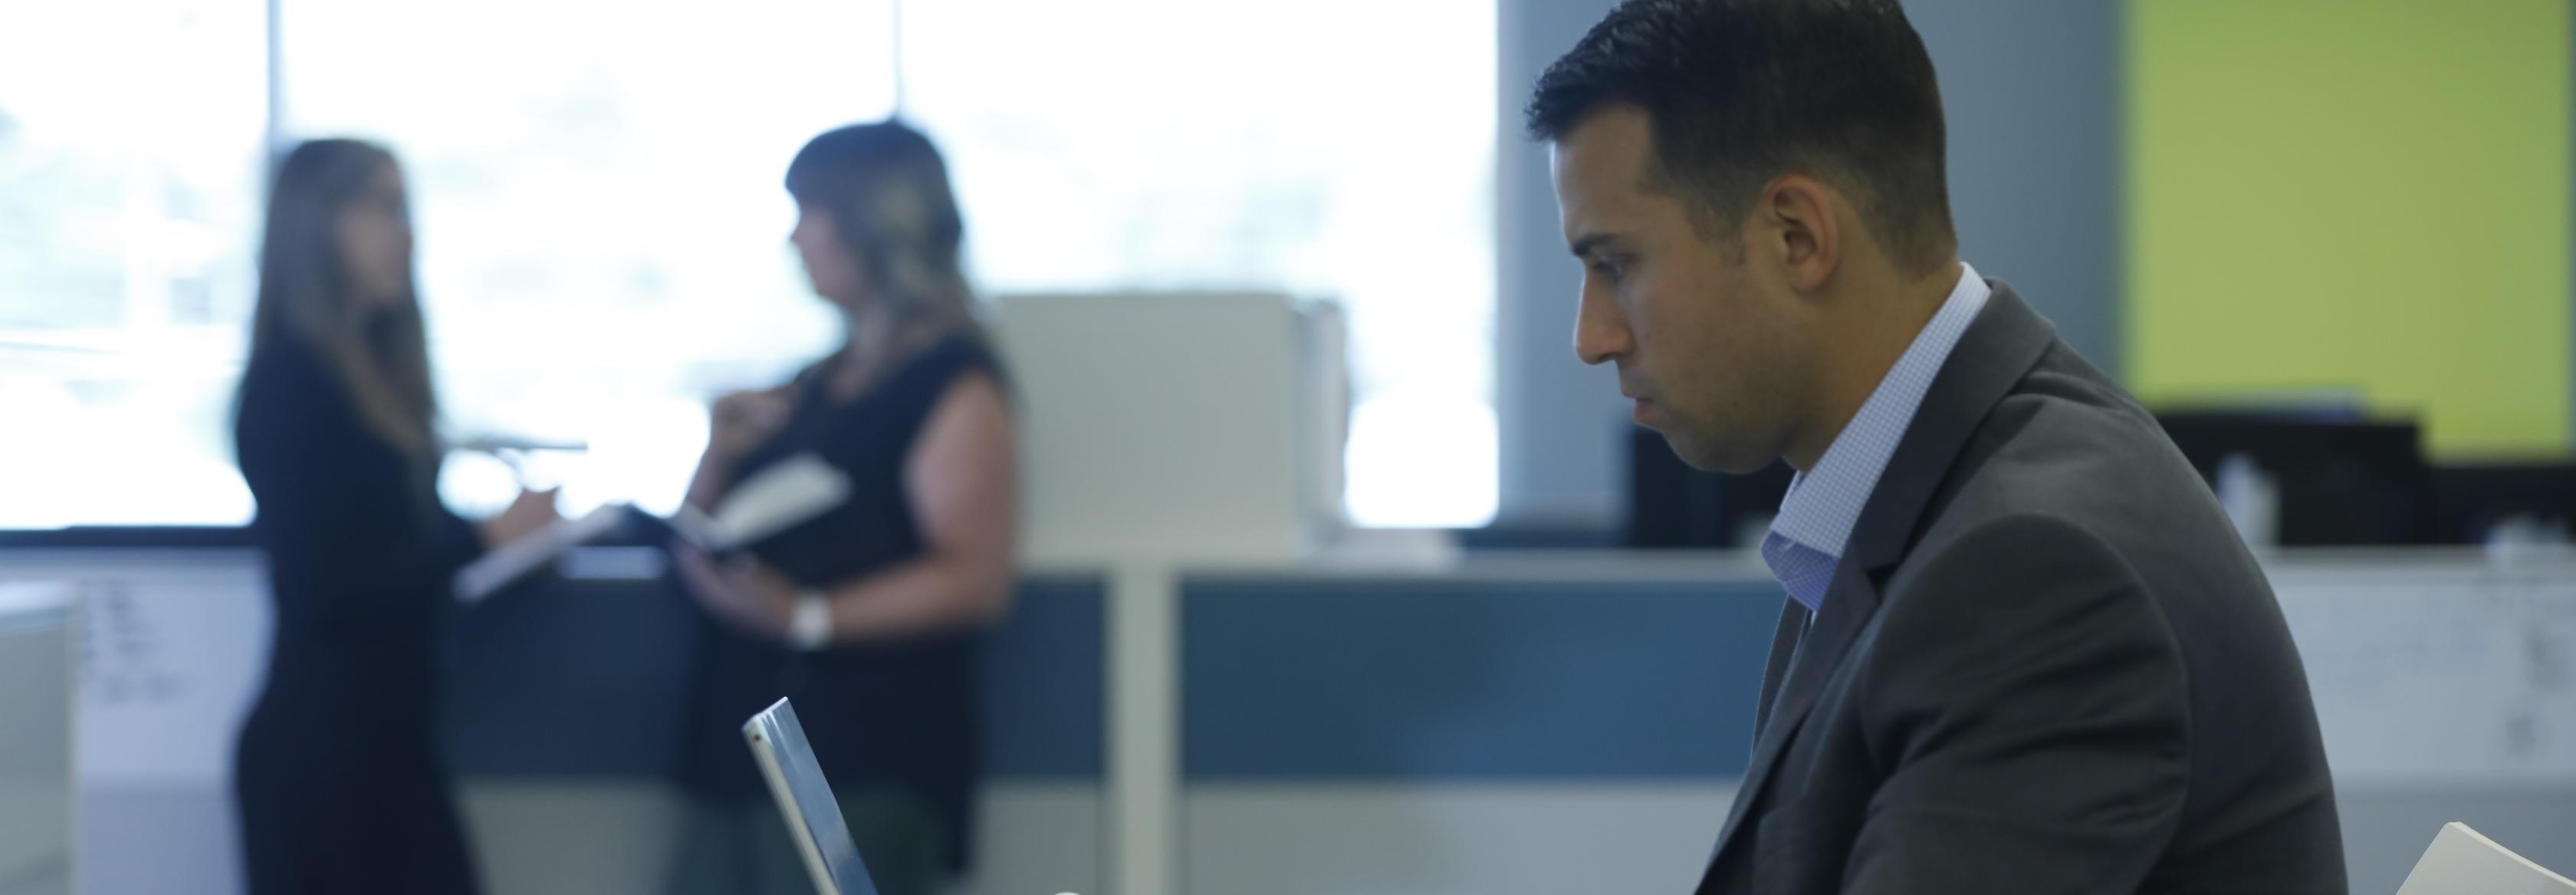 Associate working on a laptop.